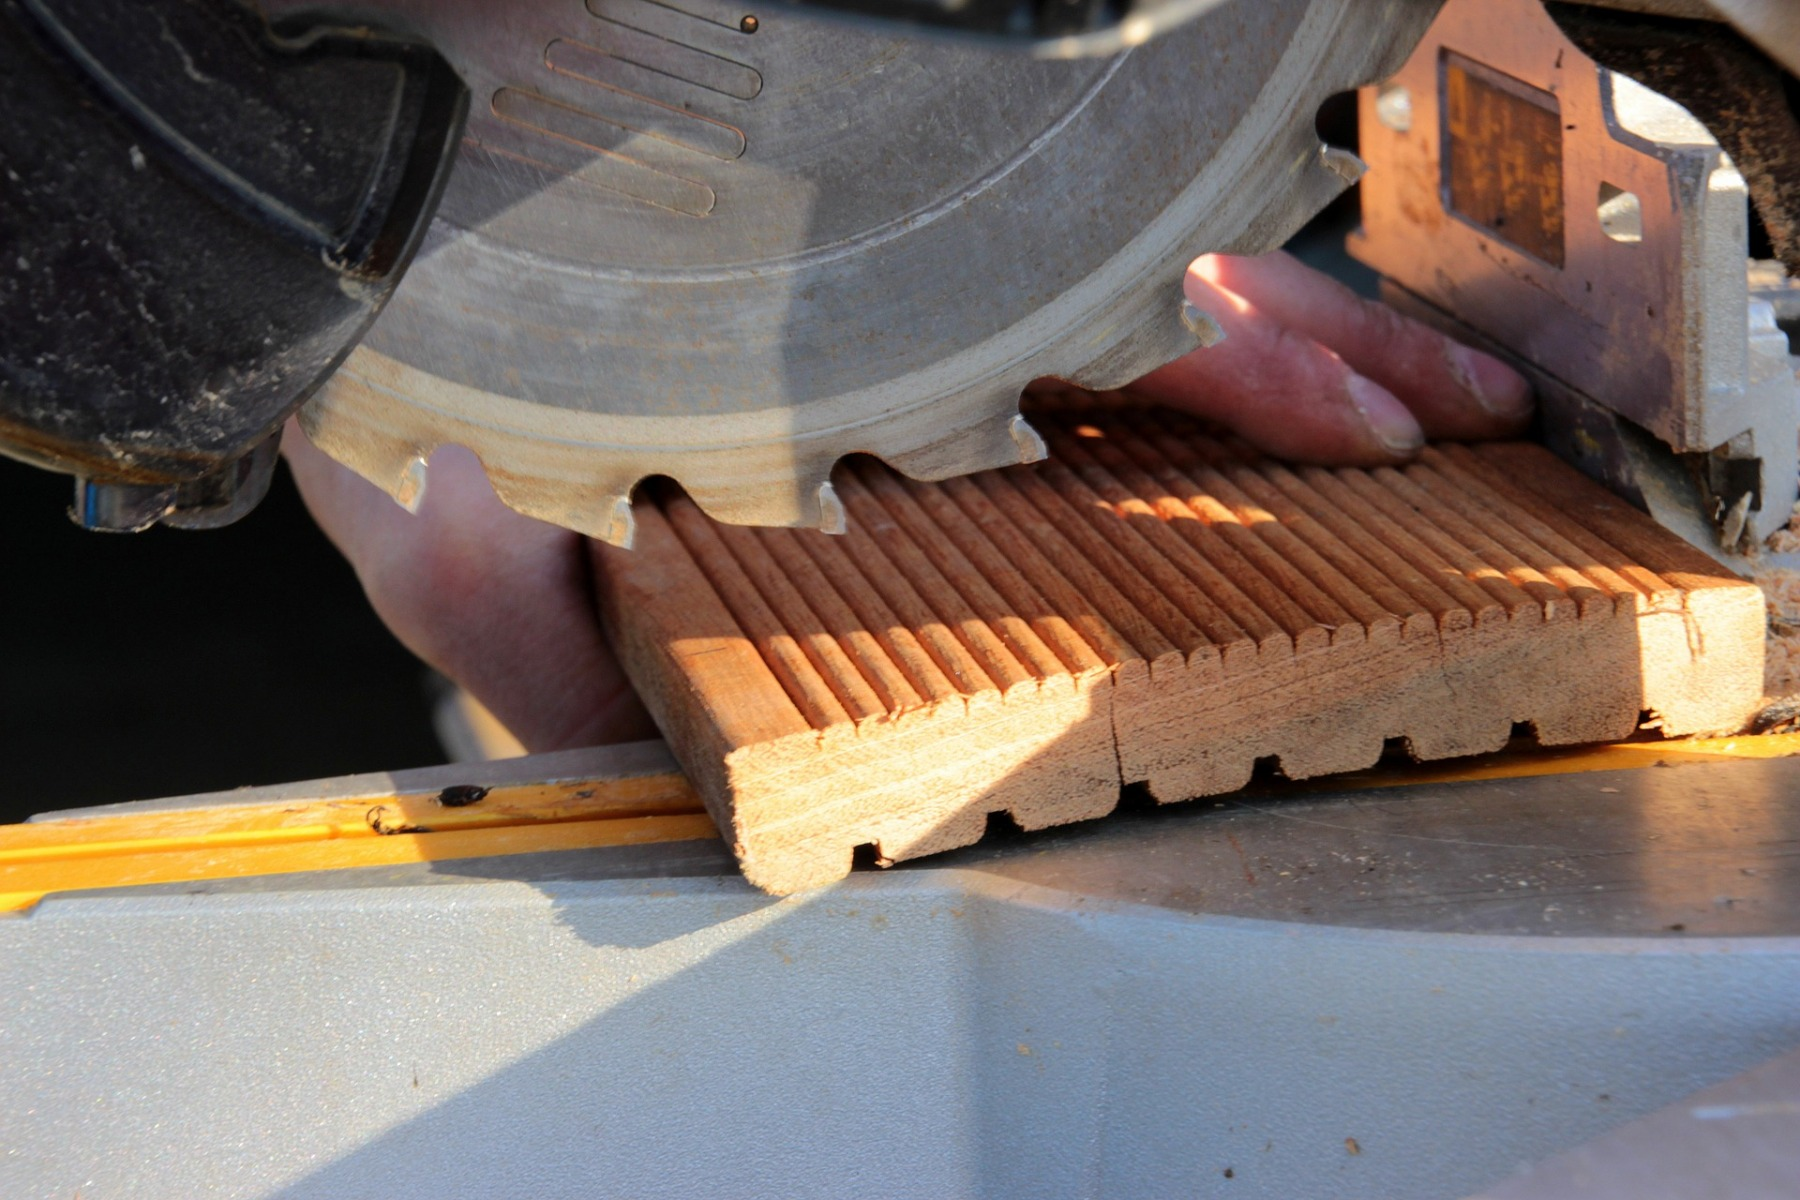 crosscut-saw-1337288_1920